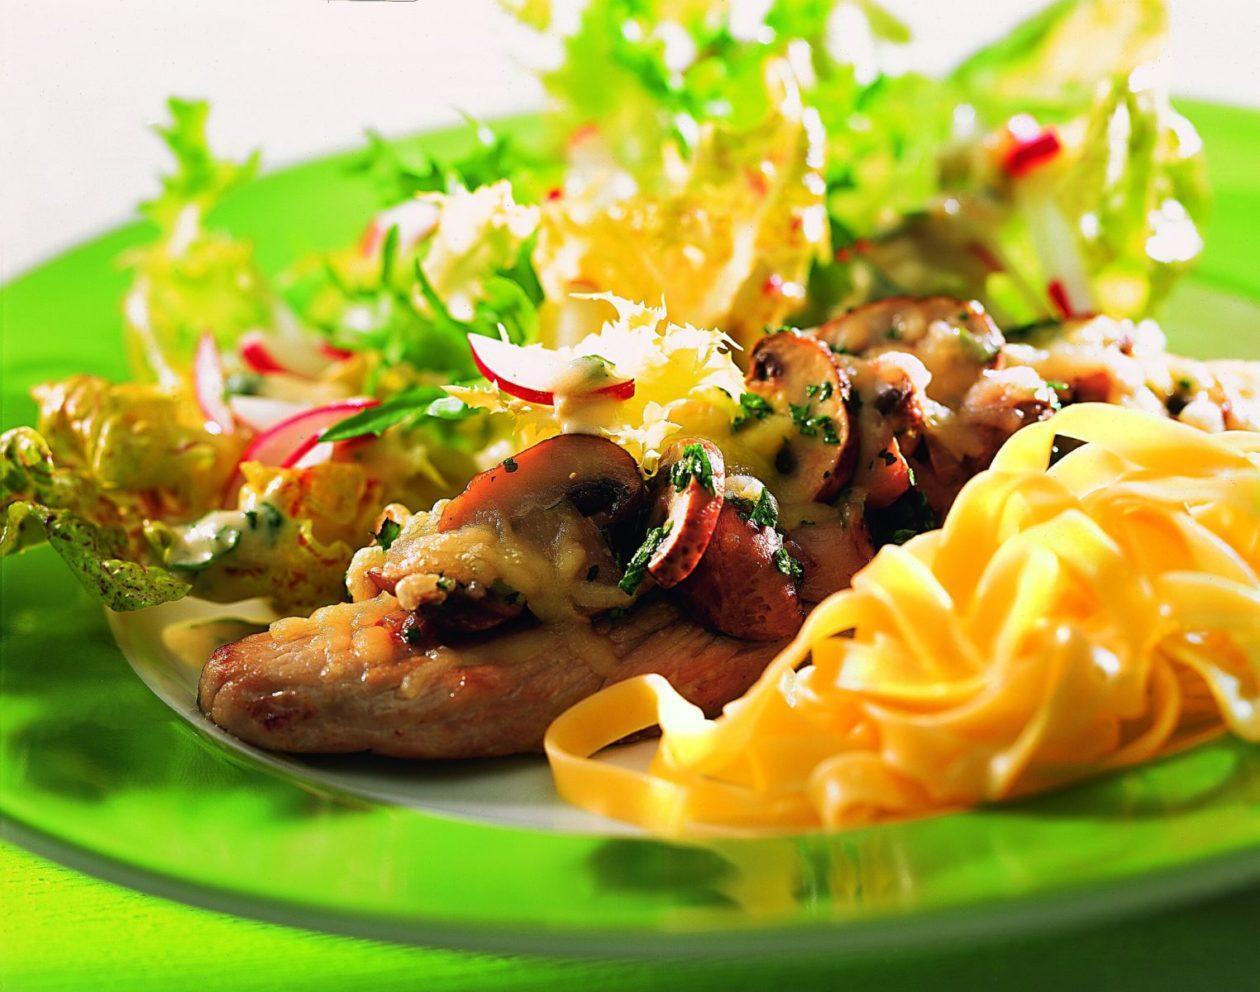 Gratinierte Champignonschnitzel - BCM Diät Rezepte.ch